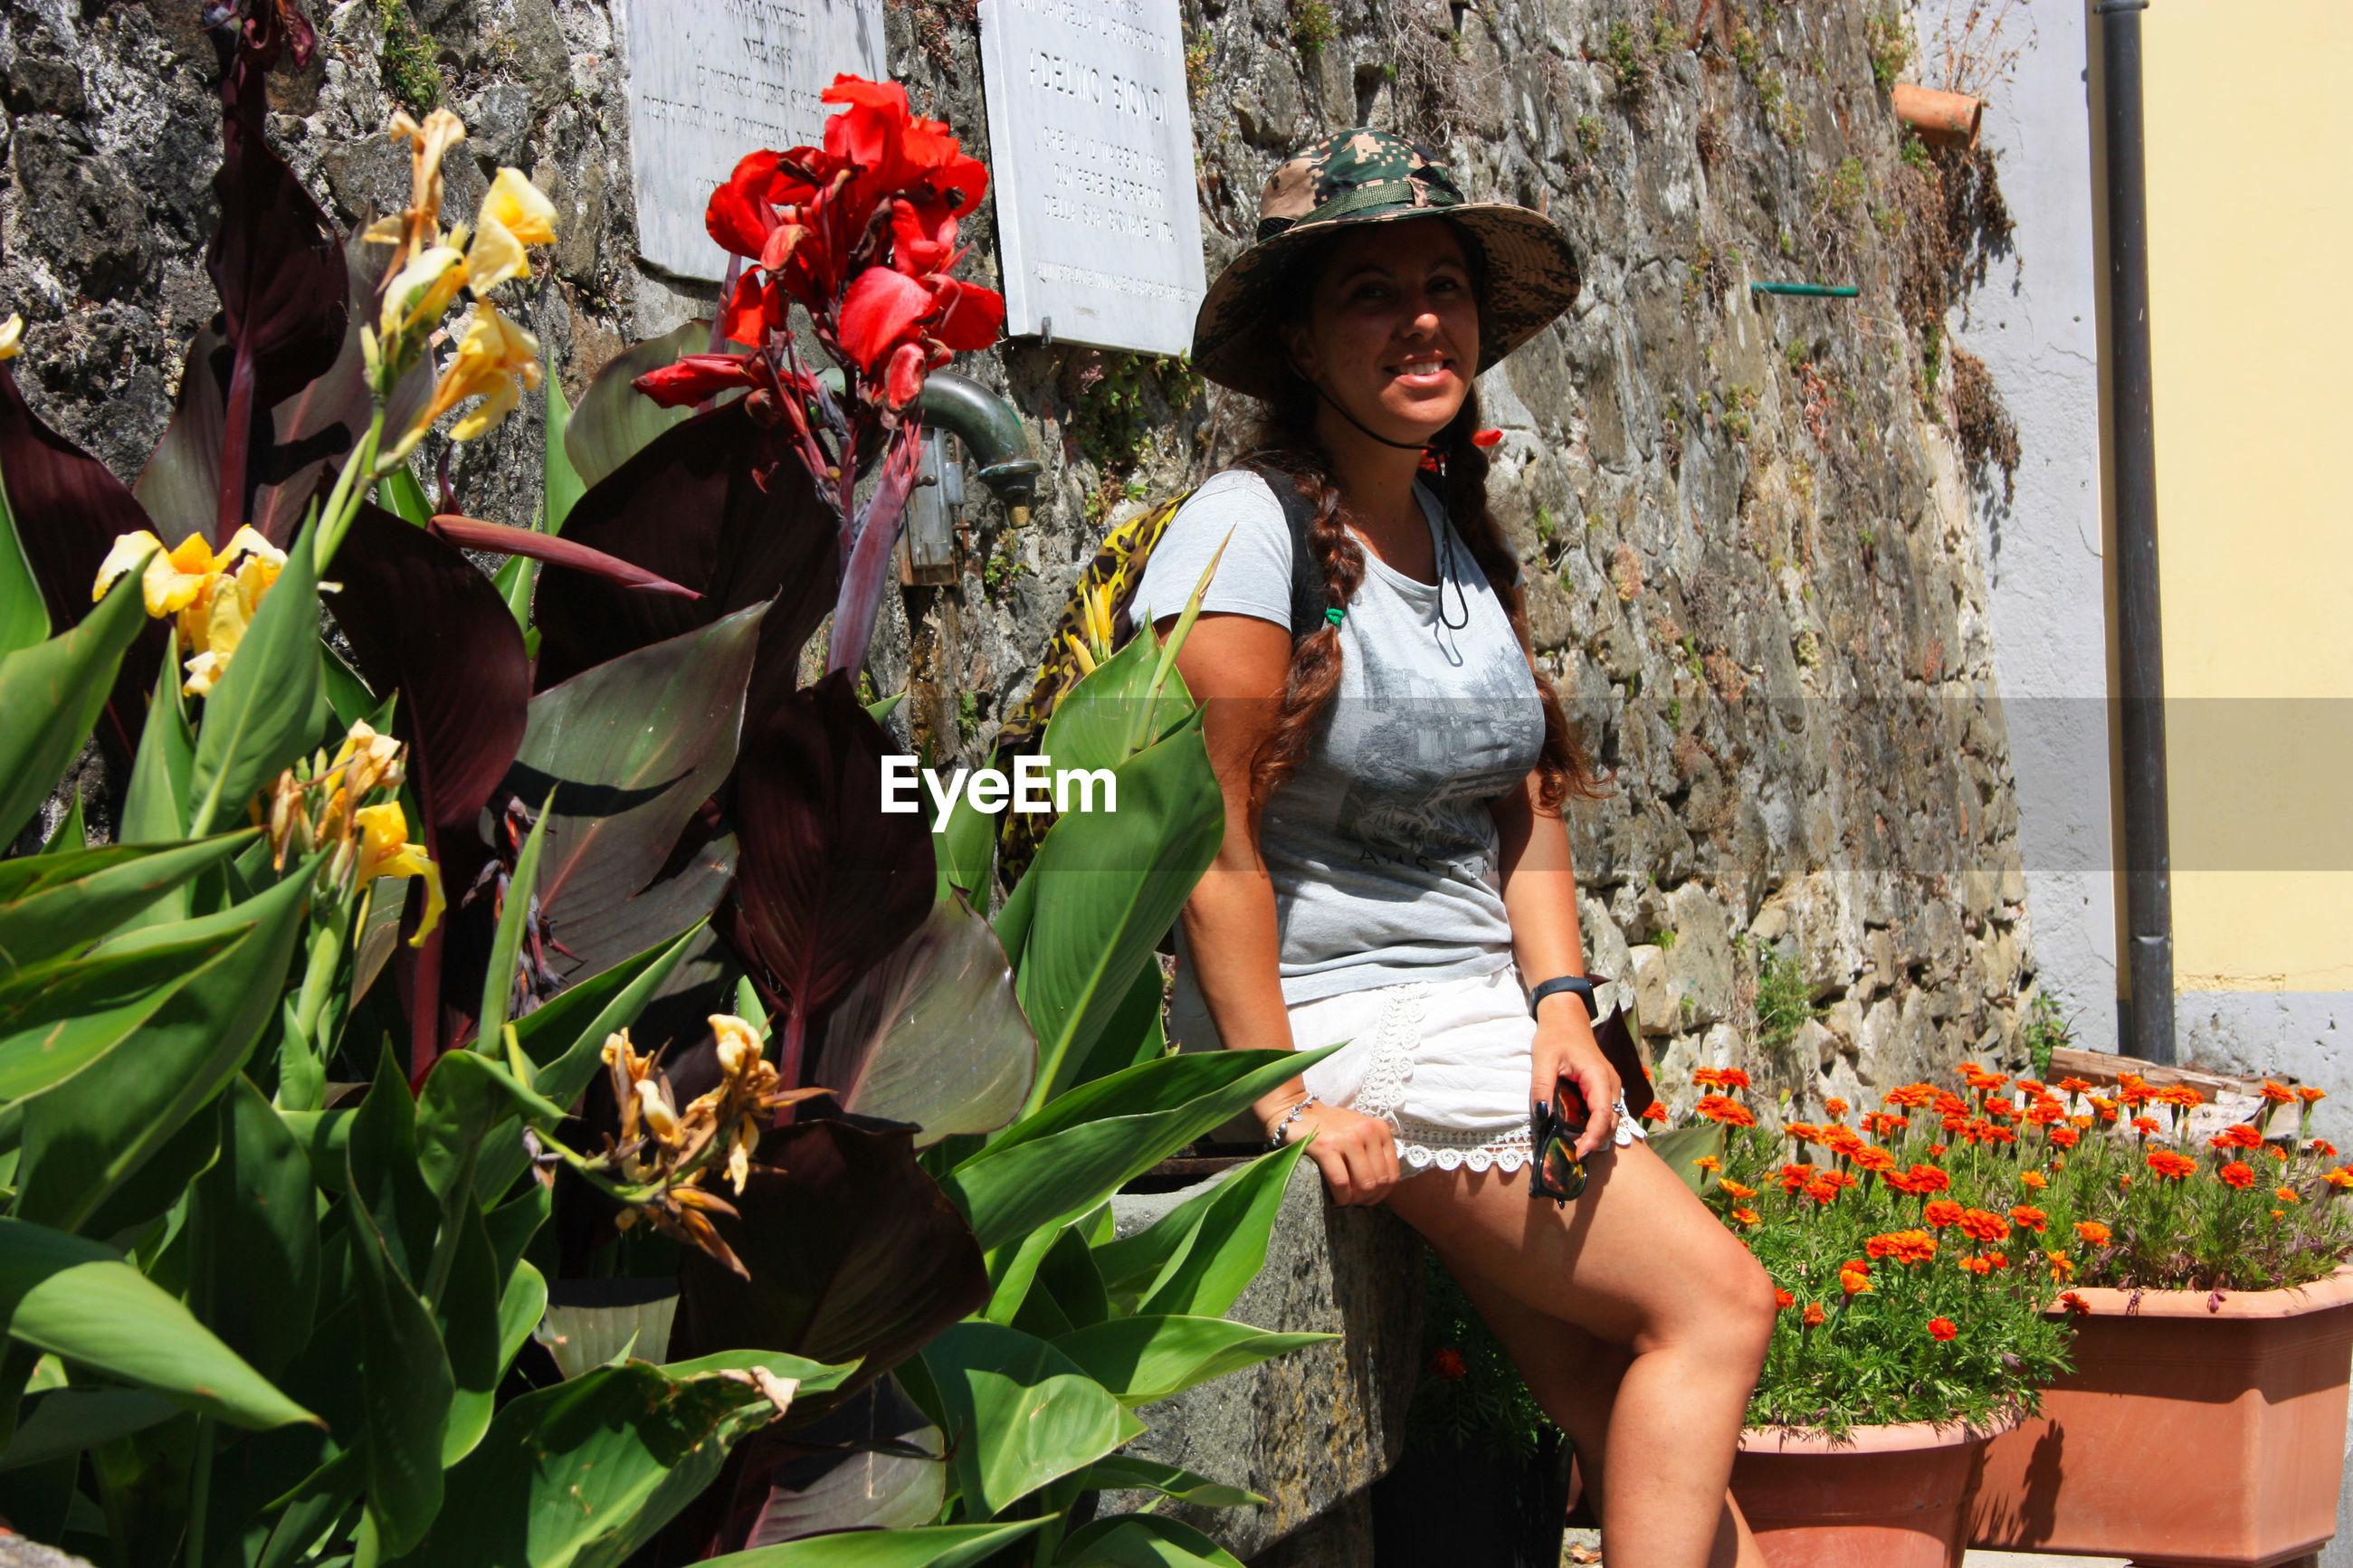 WOMAN SITTING ON PLANT